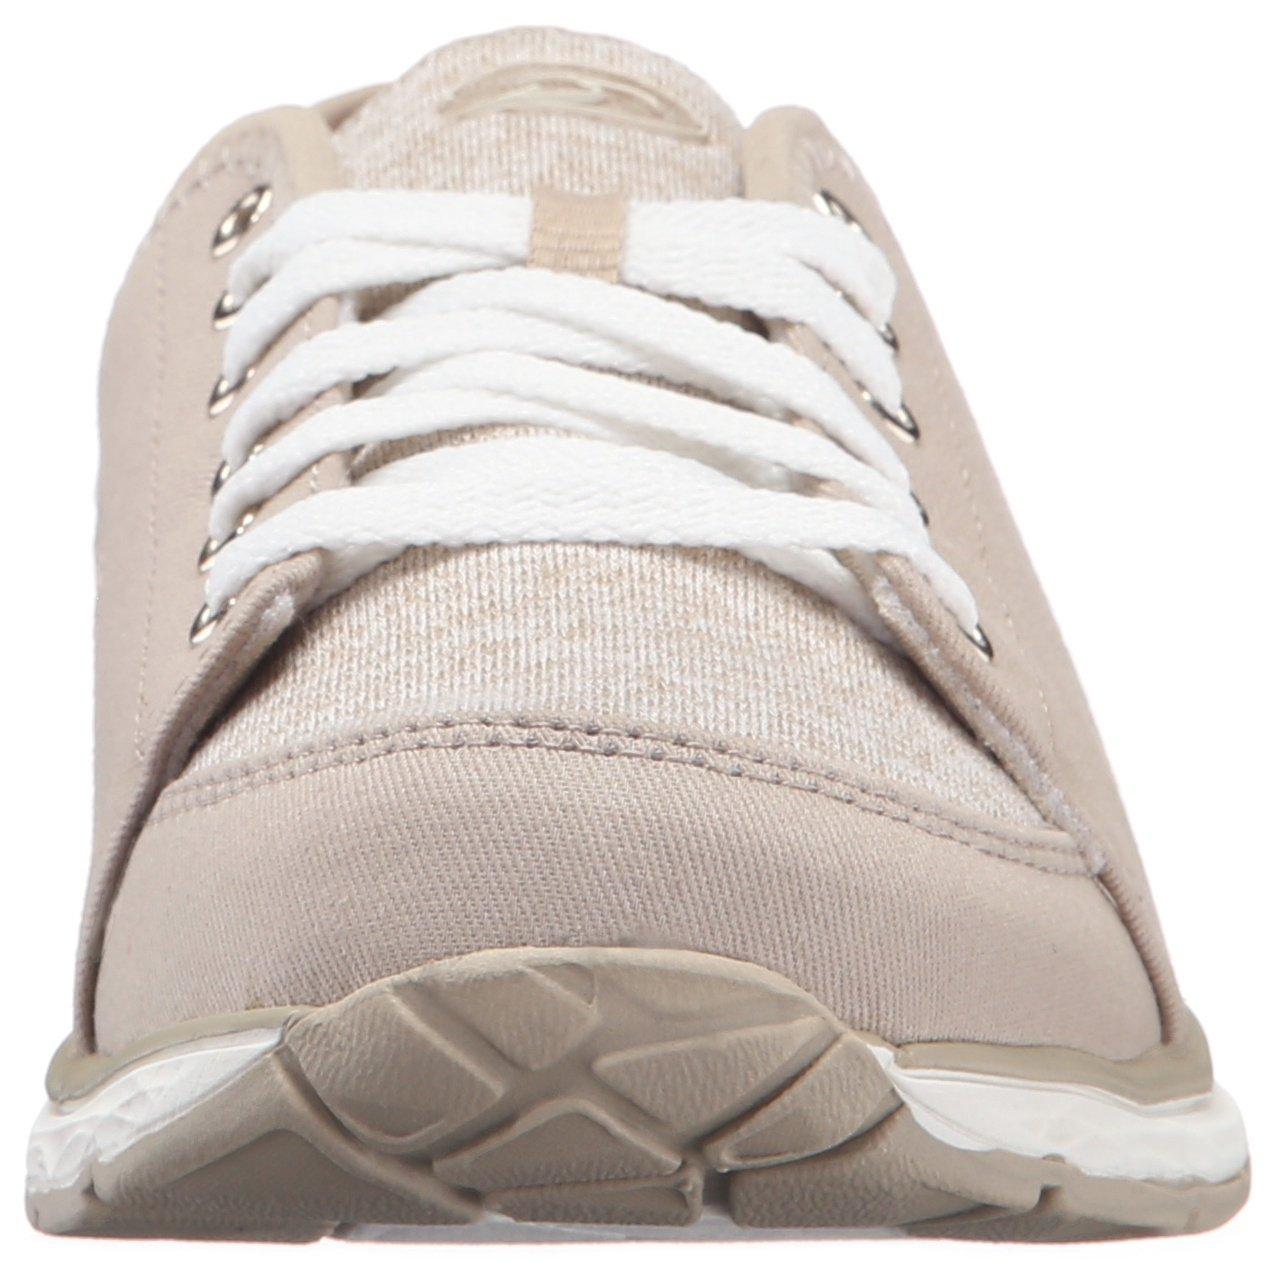 Dr. Scholl's Women's Anna Fashion Sneaker B01DF08EAY 6.5 B(M) US|Moon Stone Jersey